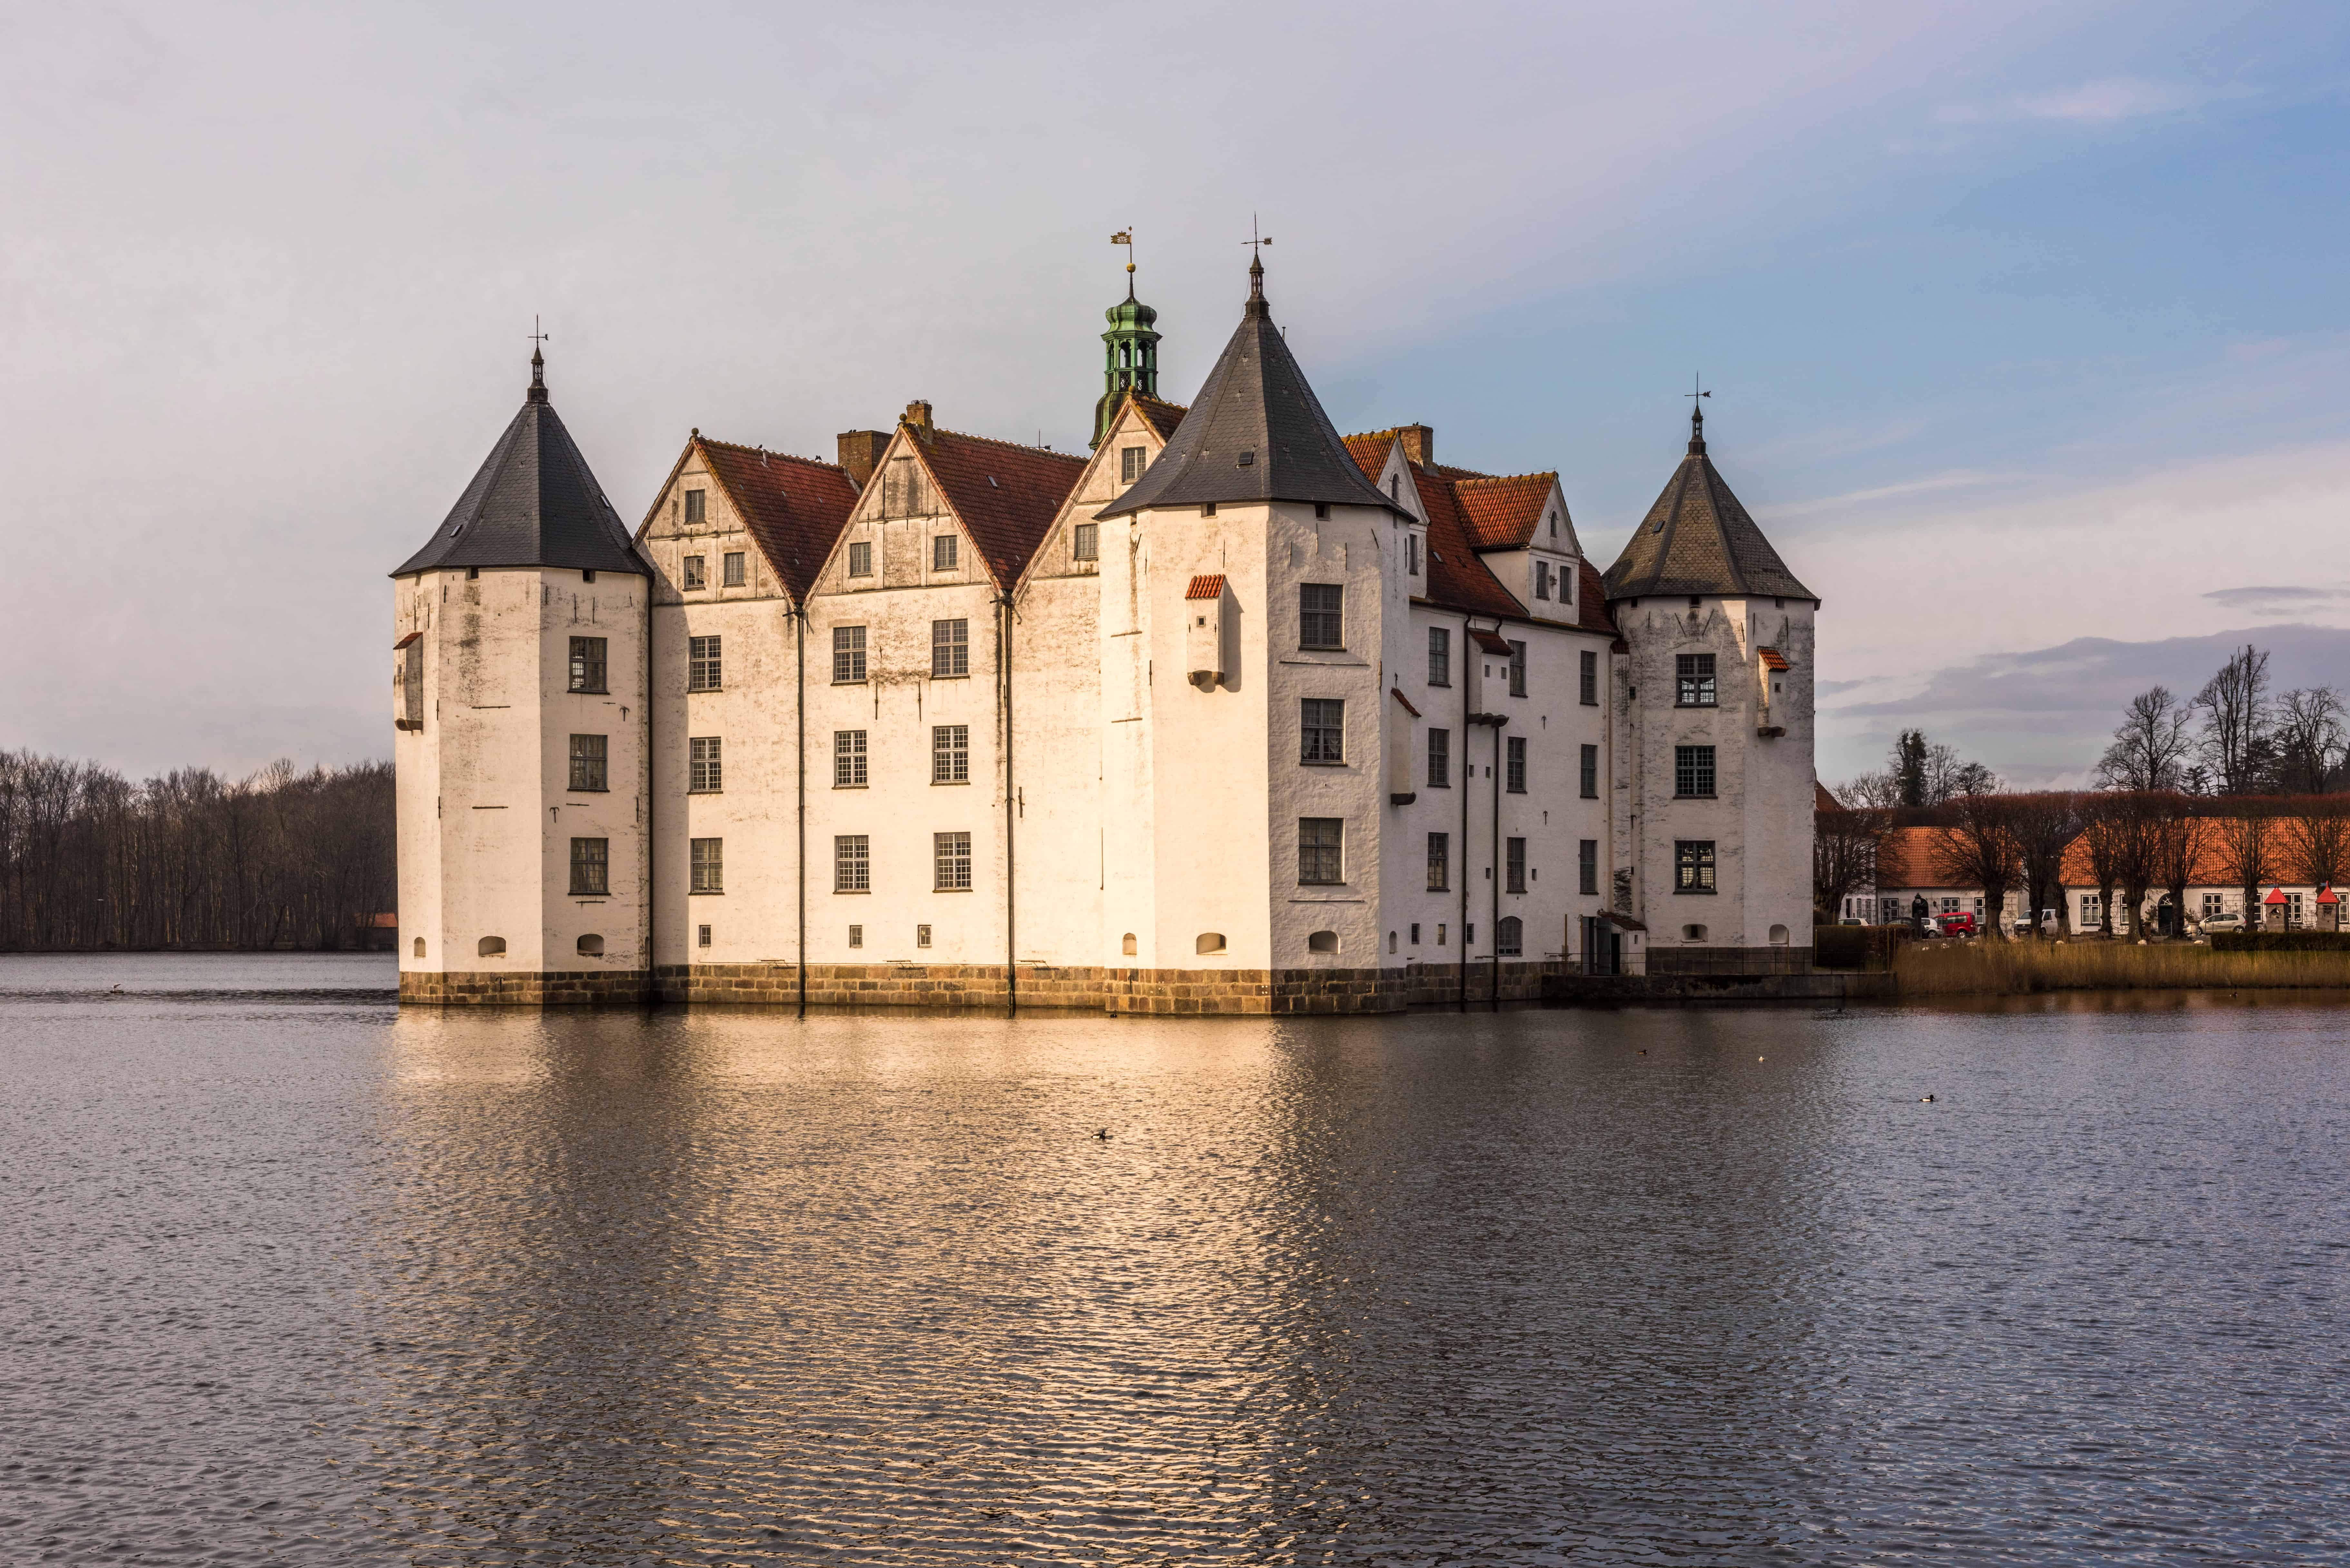 Castle Gluecksburg